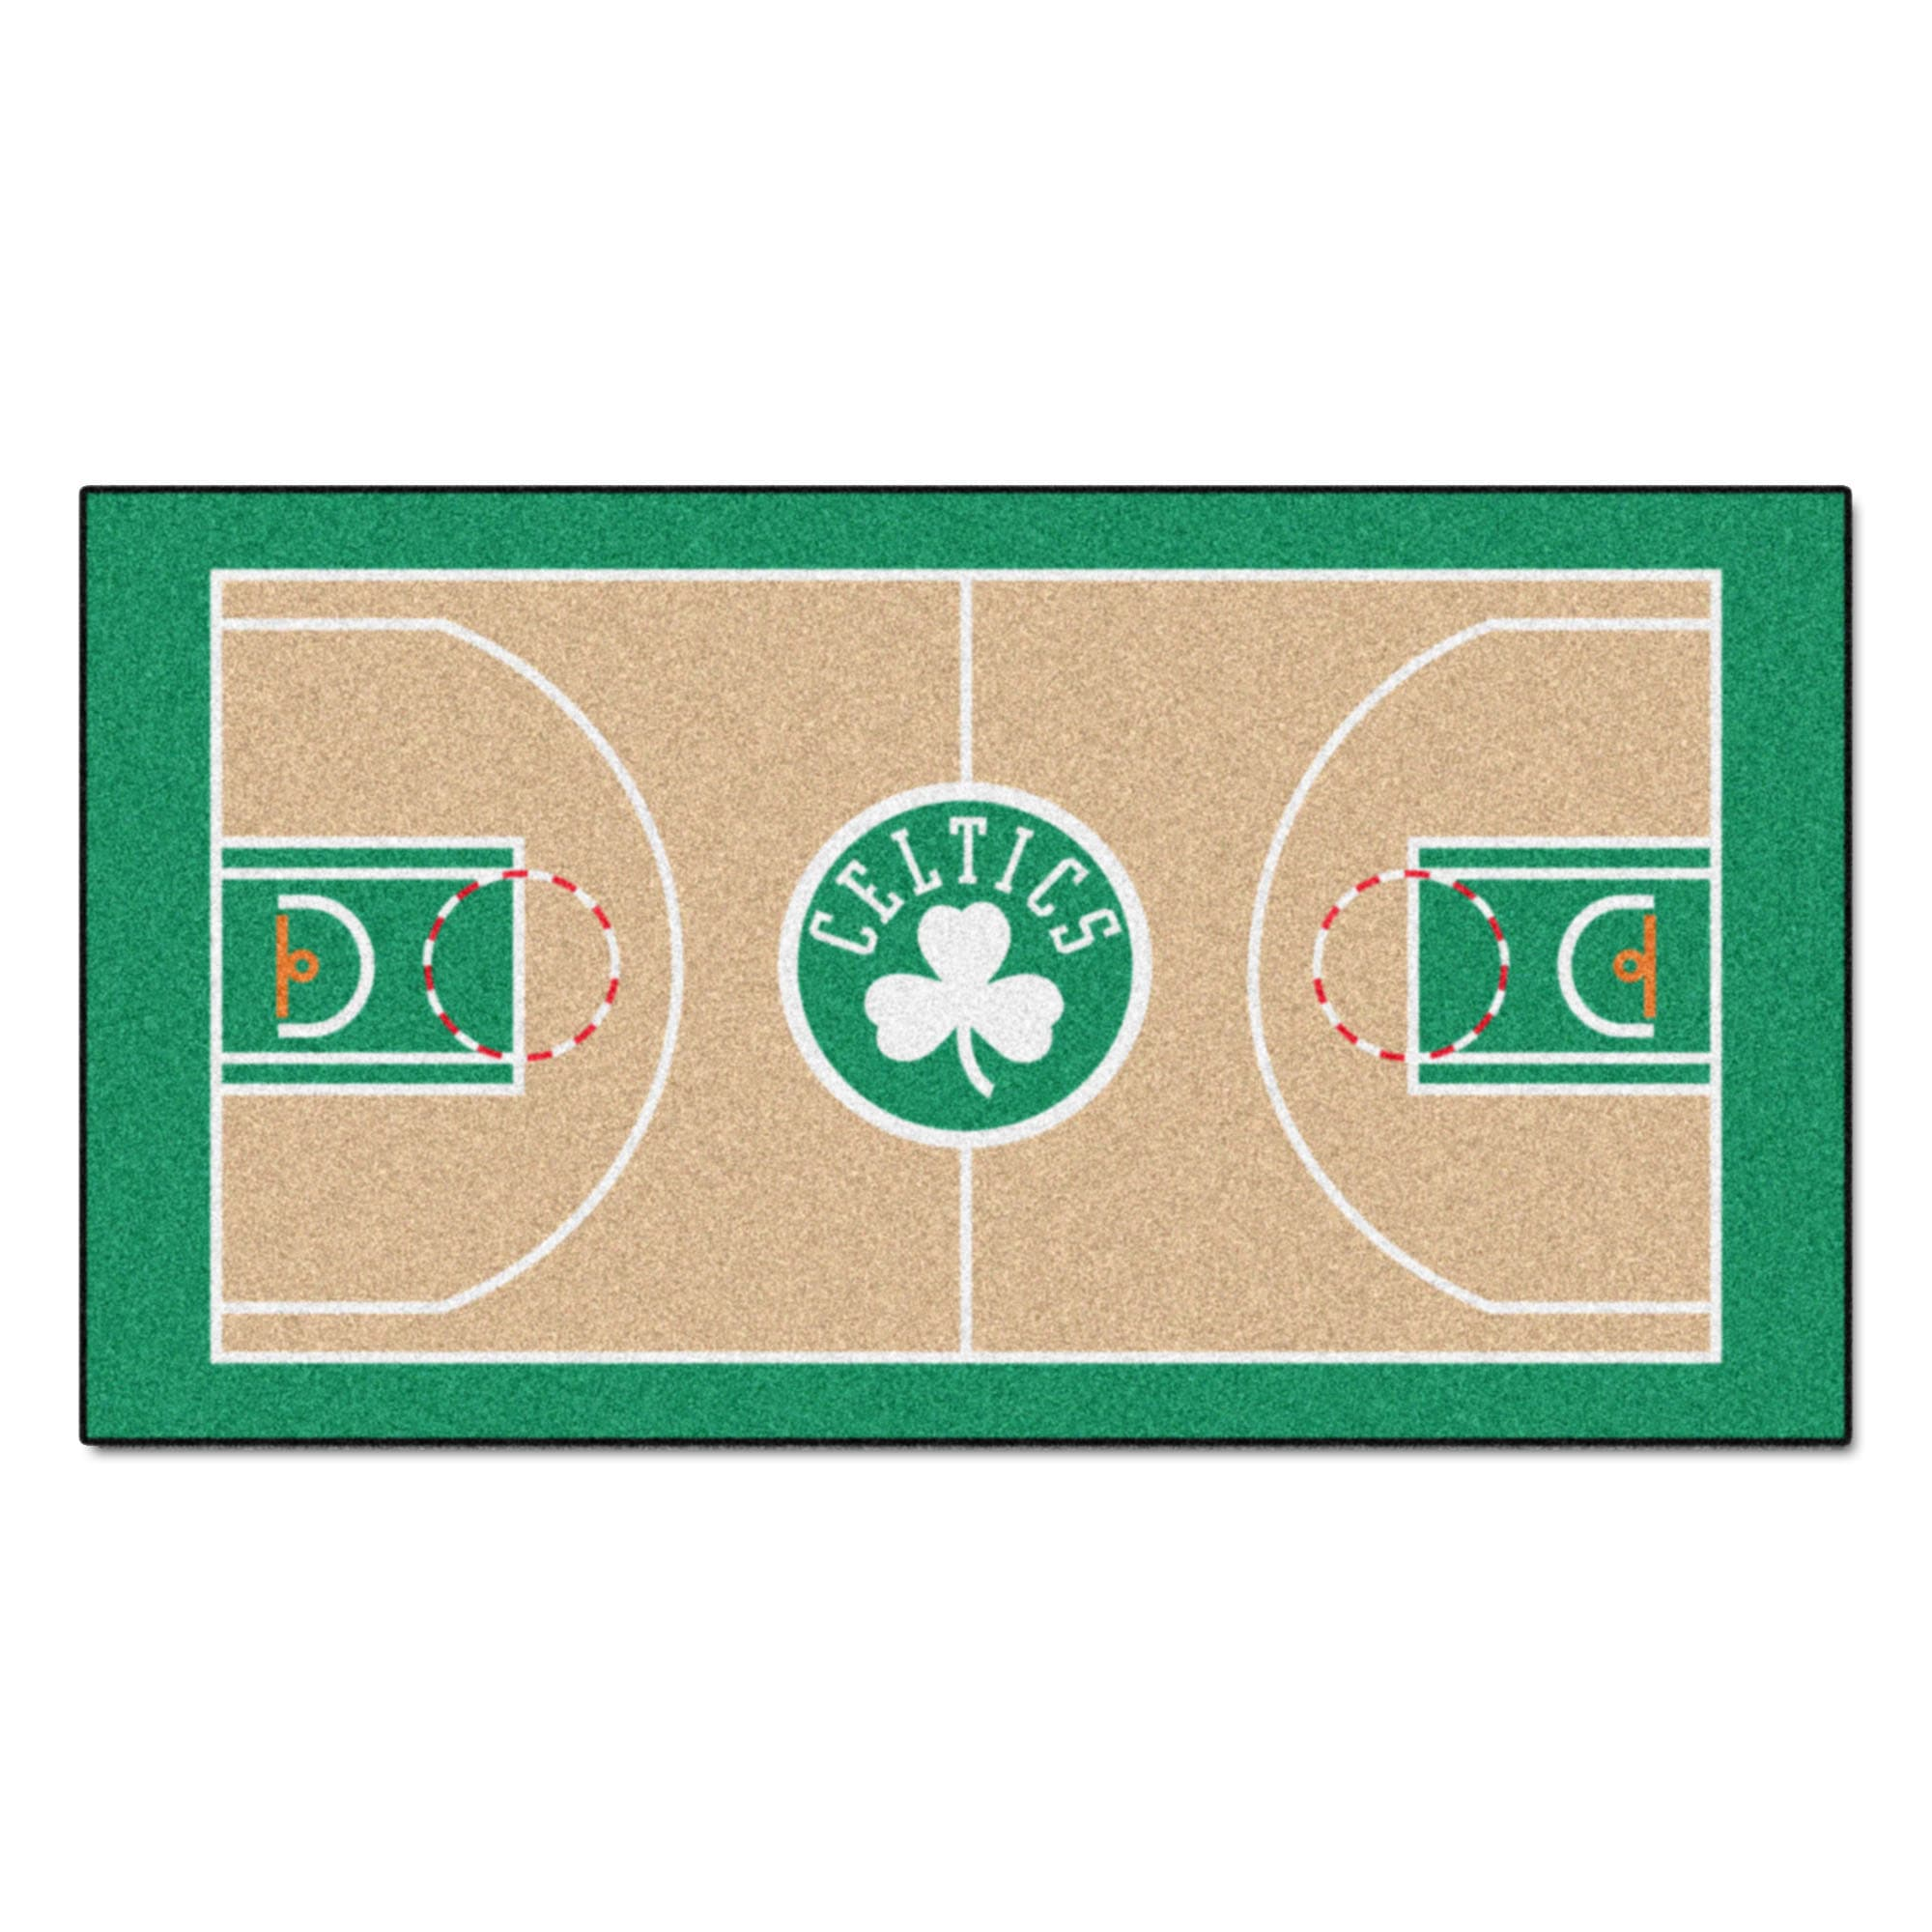 Fan Mats Machine-made Boston Celtics Tan Nylon Large Cour...